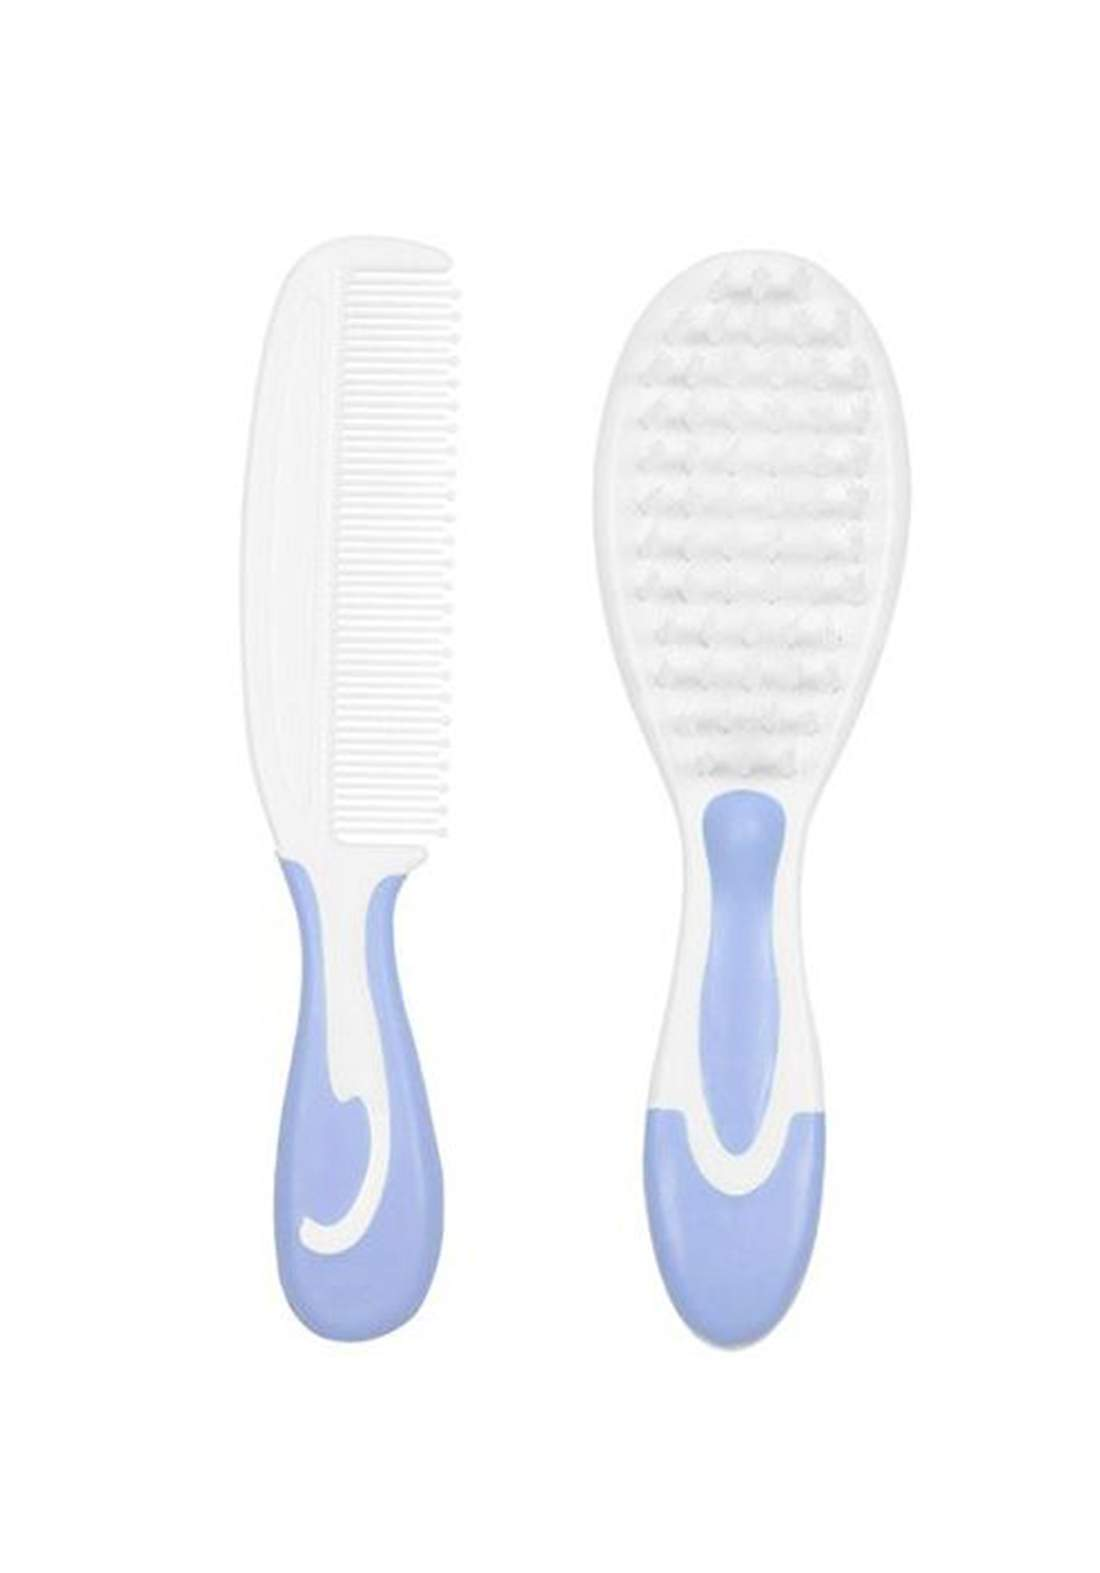 Wee Baby 803 Brush And Hair Comb فرشاة ومشط شعر للاطفال